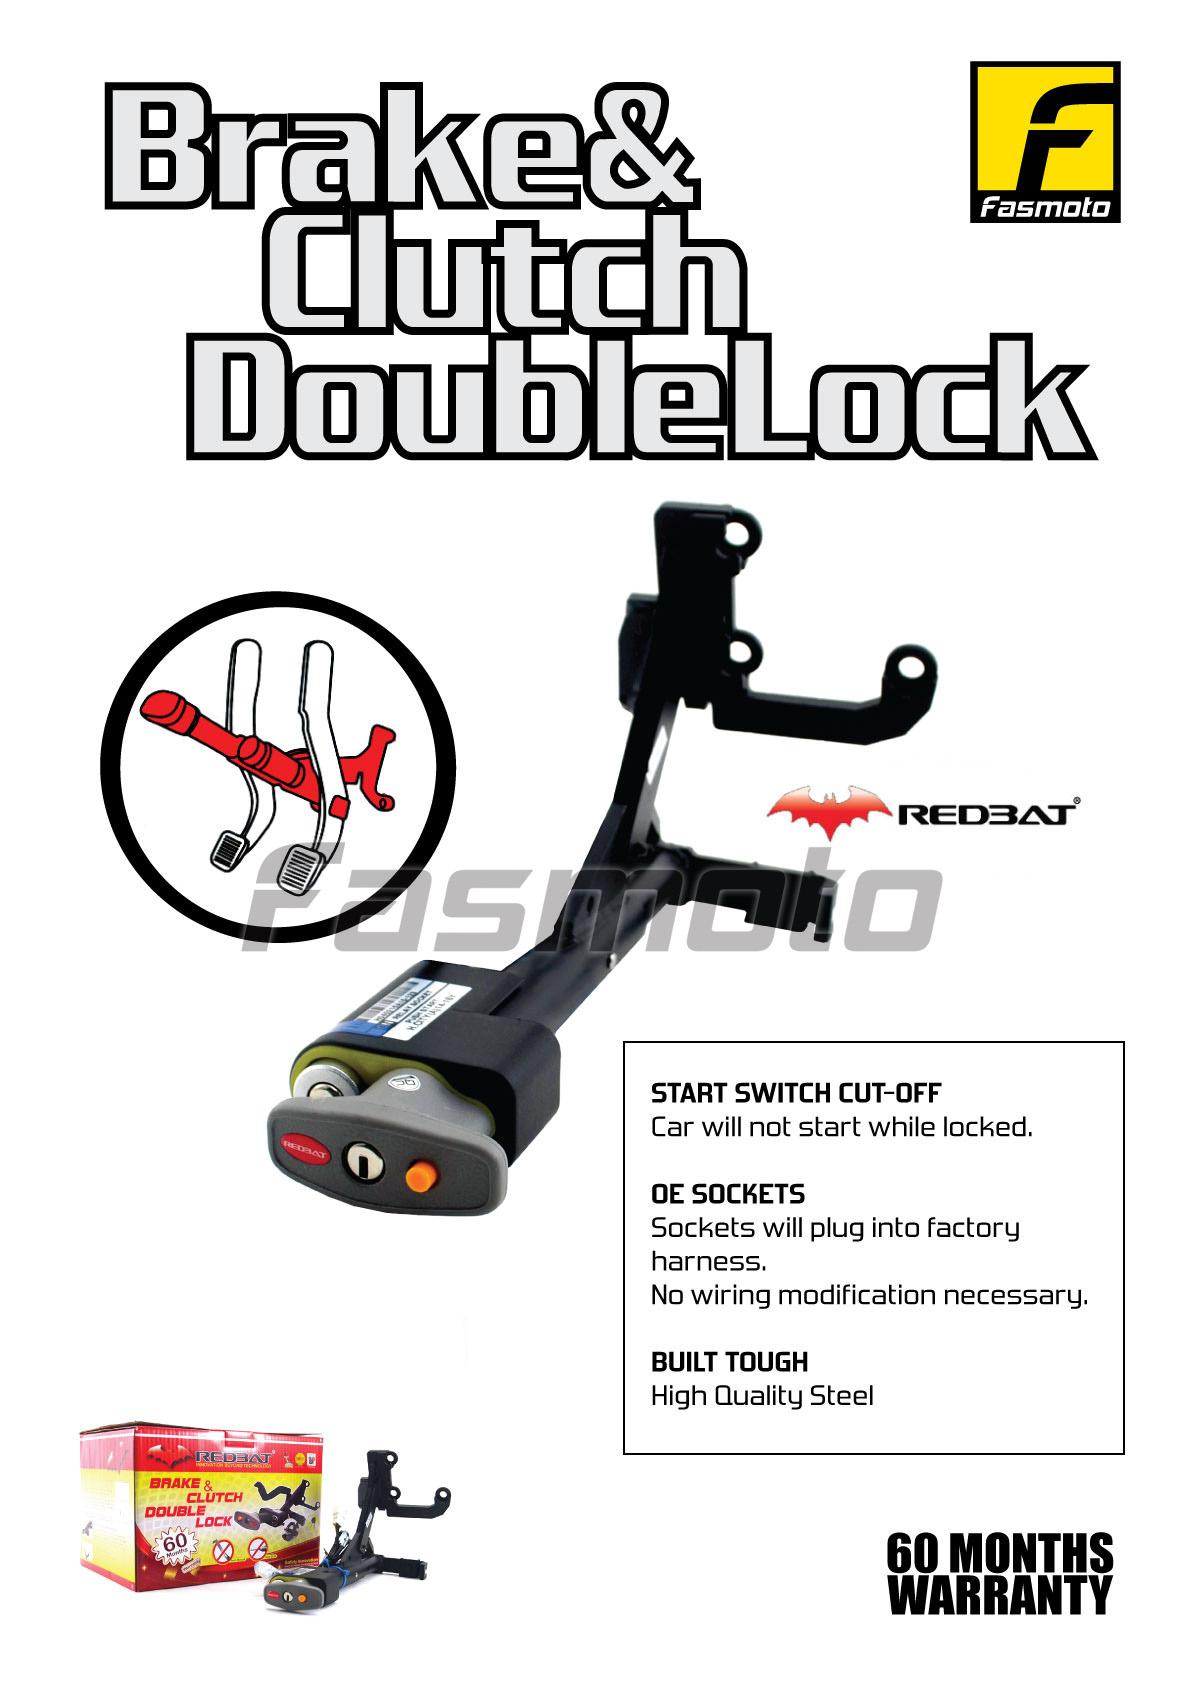 Fasmoto Redbat Double Lock